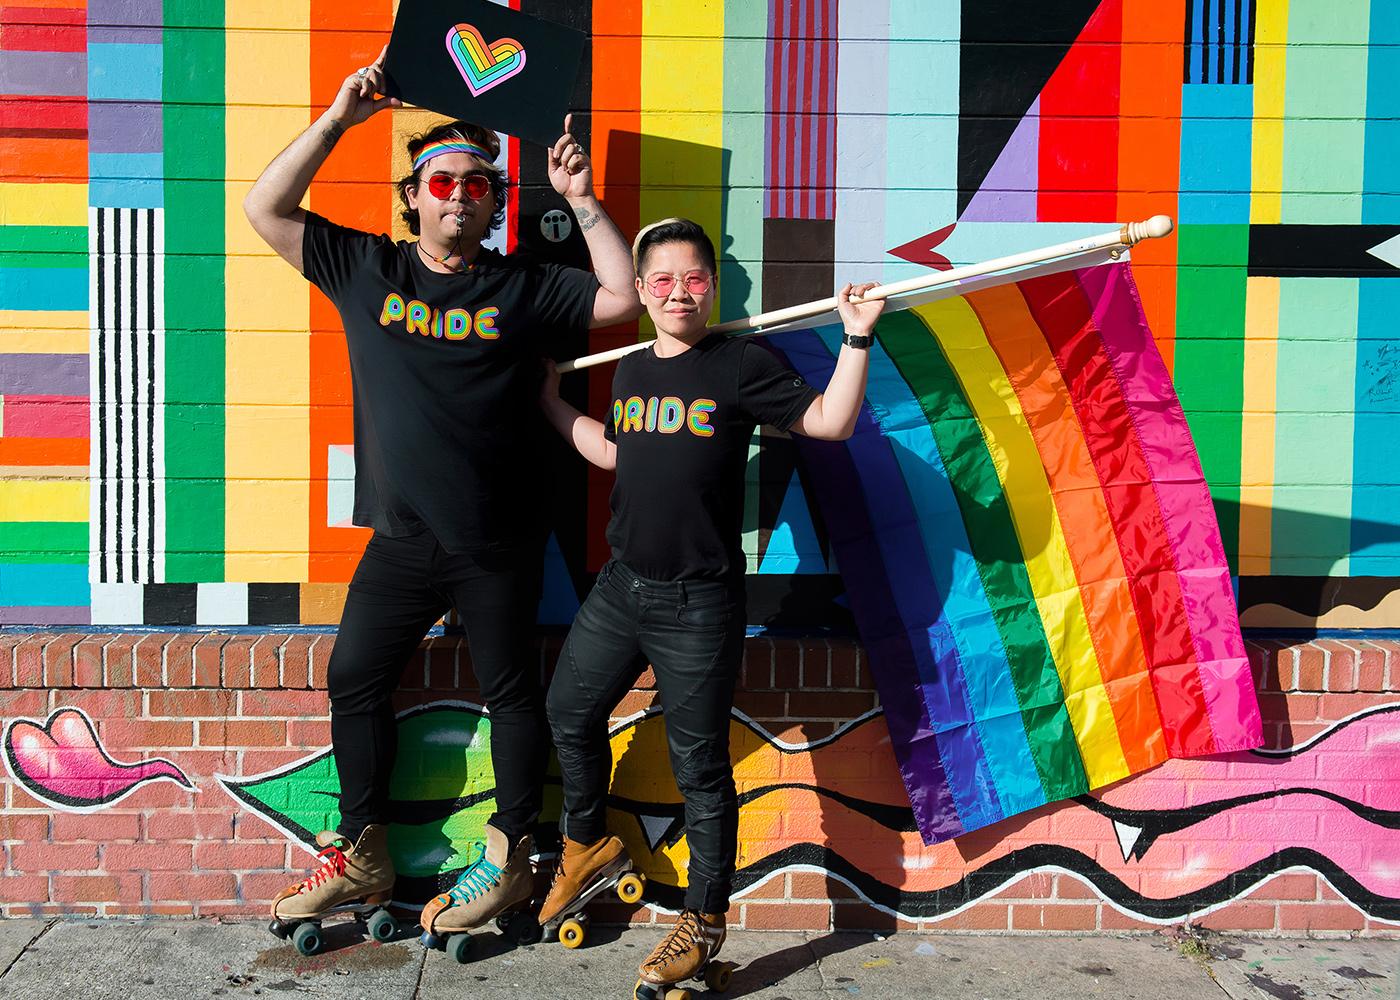 pride-shirts-photo